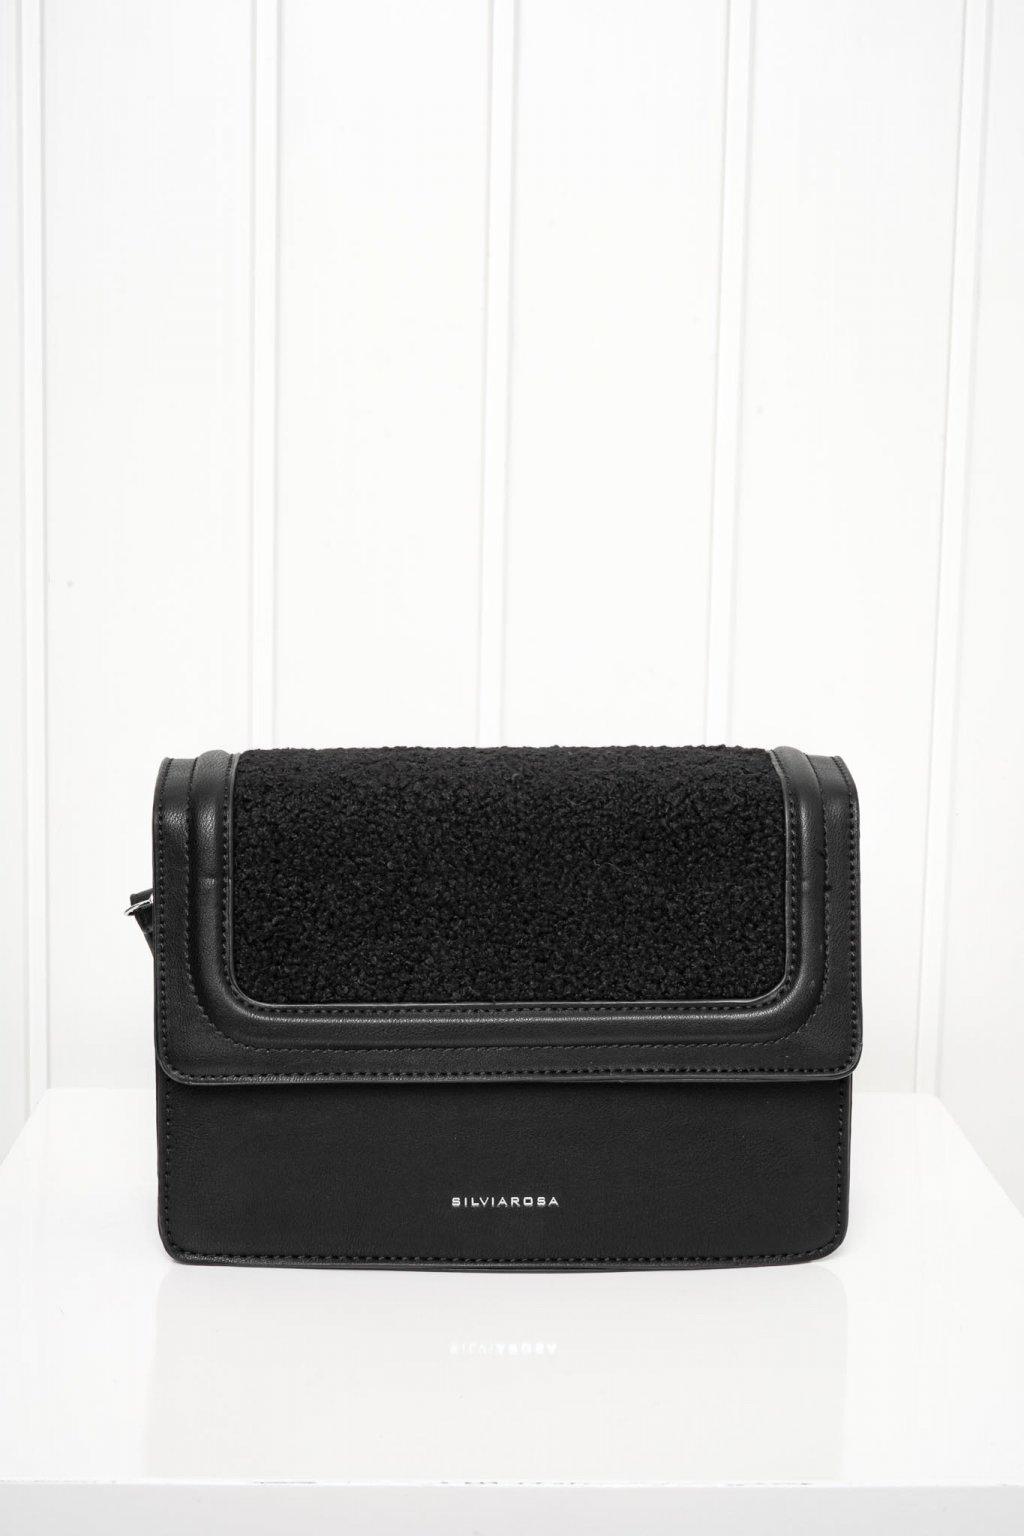 Kabelka, crossbody, ruksak, shopping bag, shopperka, 167